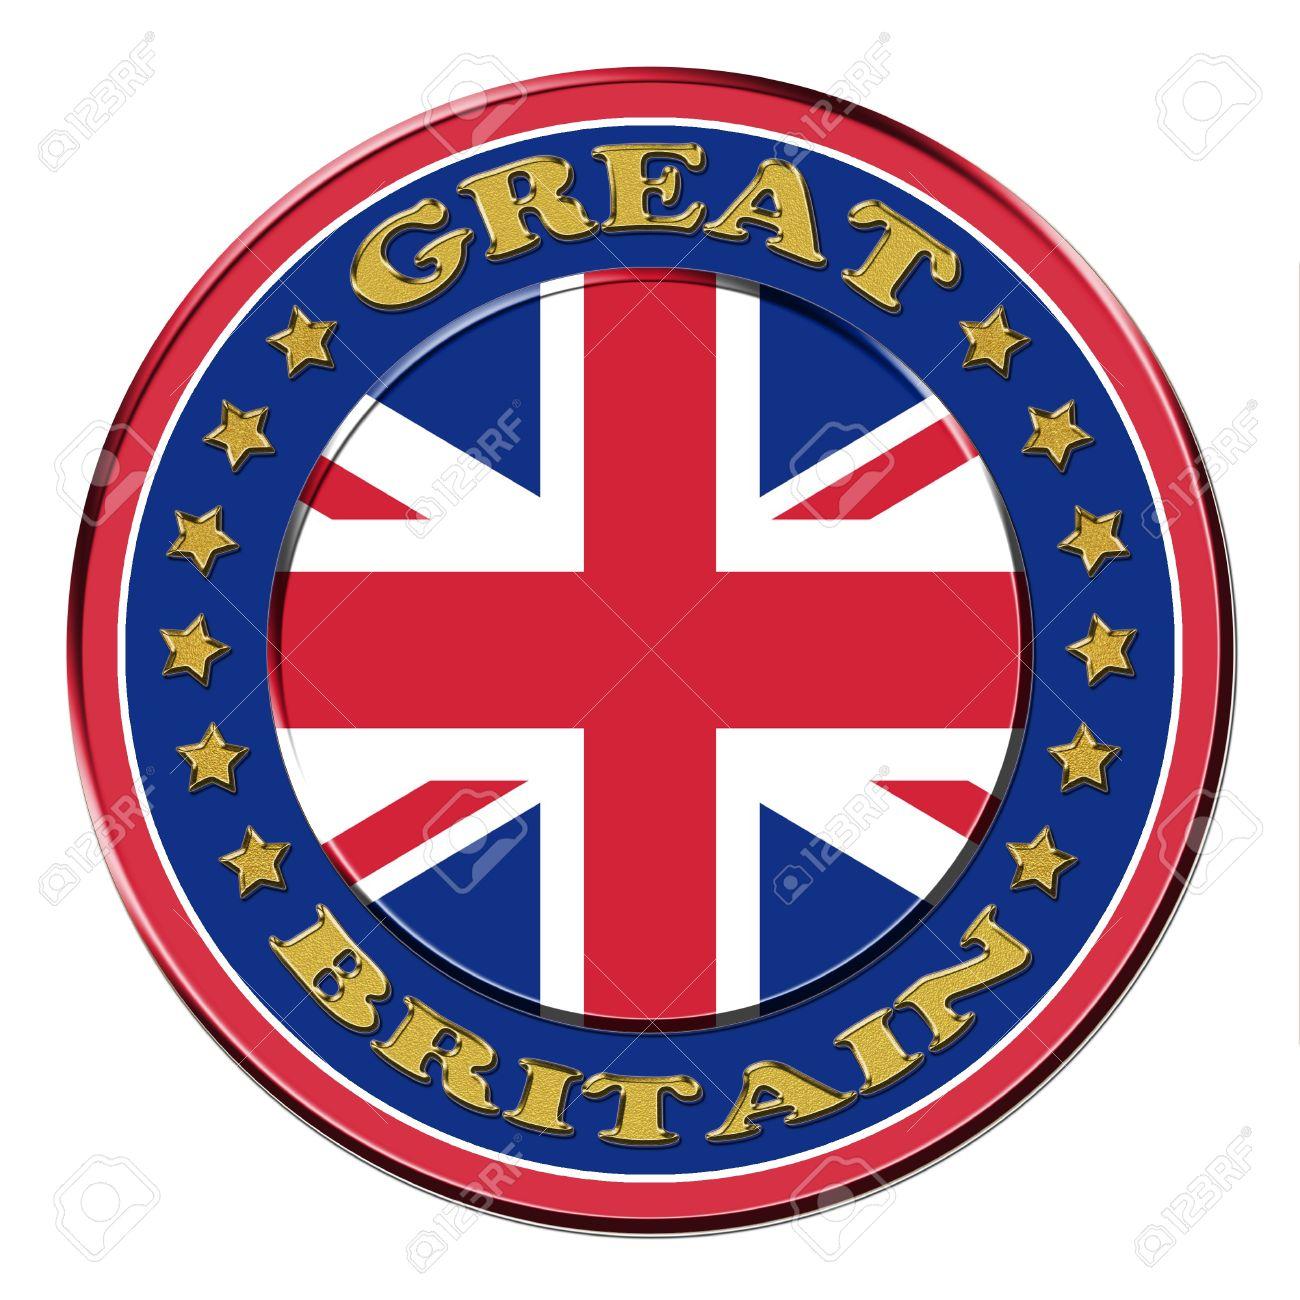 http://previews.123rf.com/images/lina0486/lina04861206/lina0486120600115/14220336-Award-with-the-symbols-of-Great-Britain-Stock-Photo.jpg